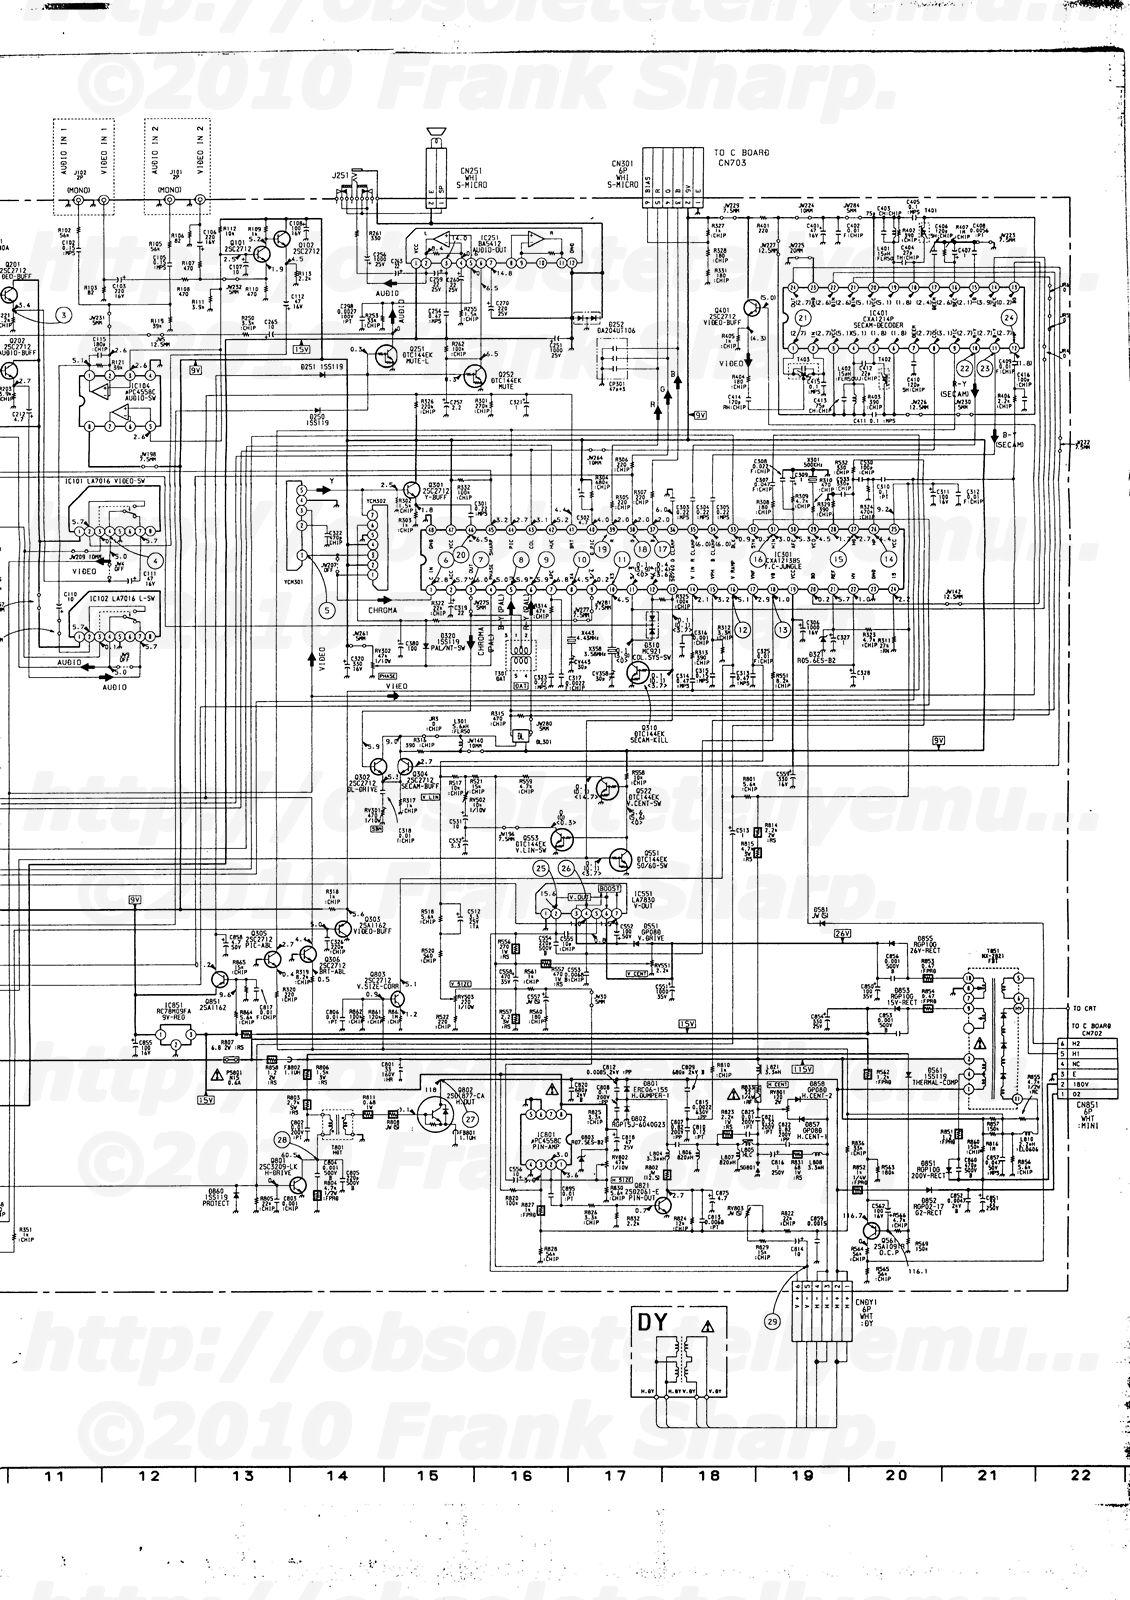 Charmant Sony Stereo Kabelbaum Diagramm Ideen - Schaltplan Serie ...